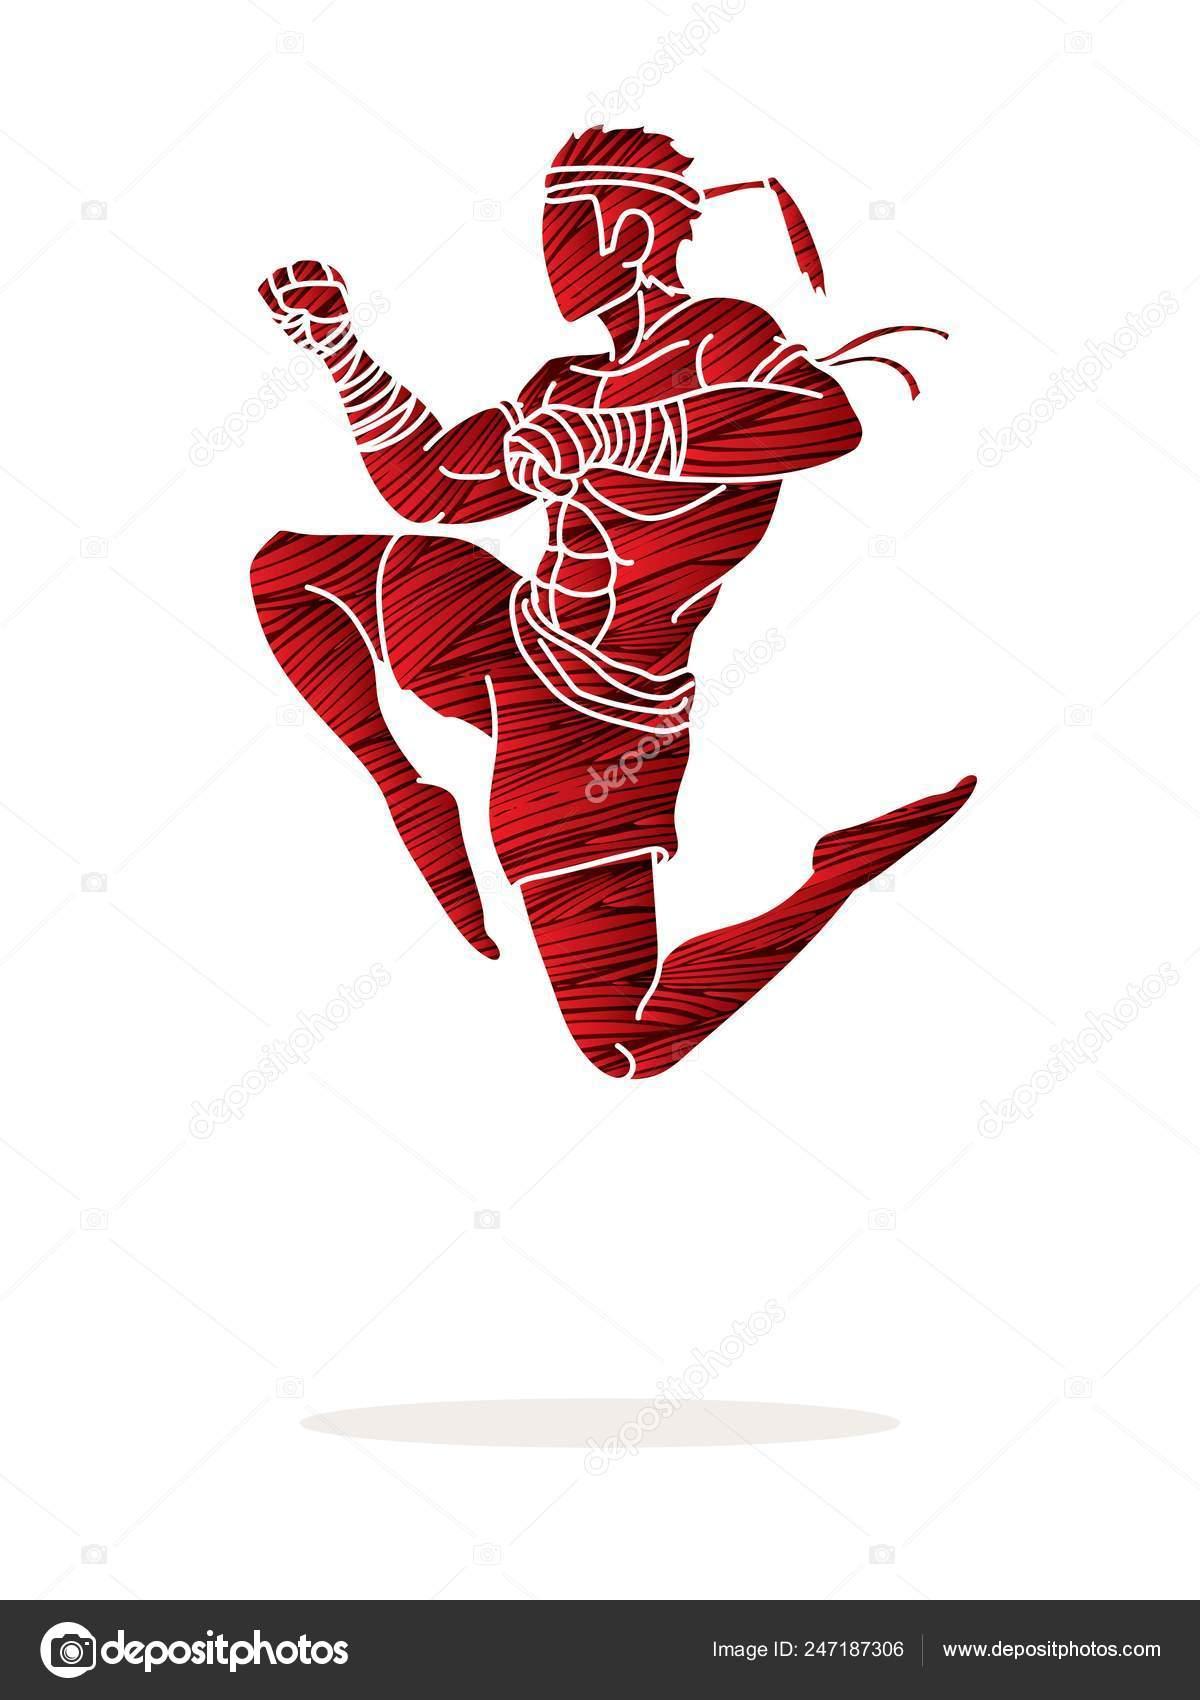 Muay Thai Fighting Thai Boxing Jumping Attack Cartoon Graphic